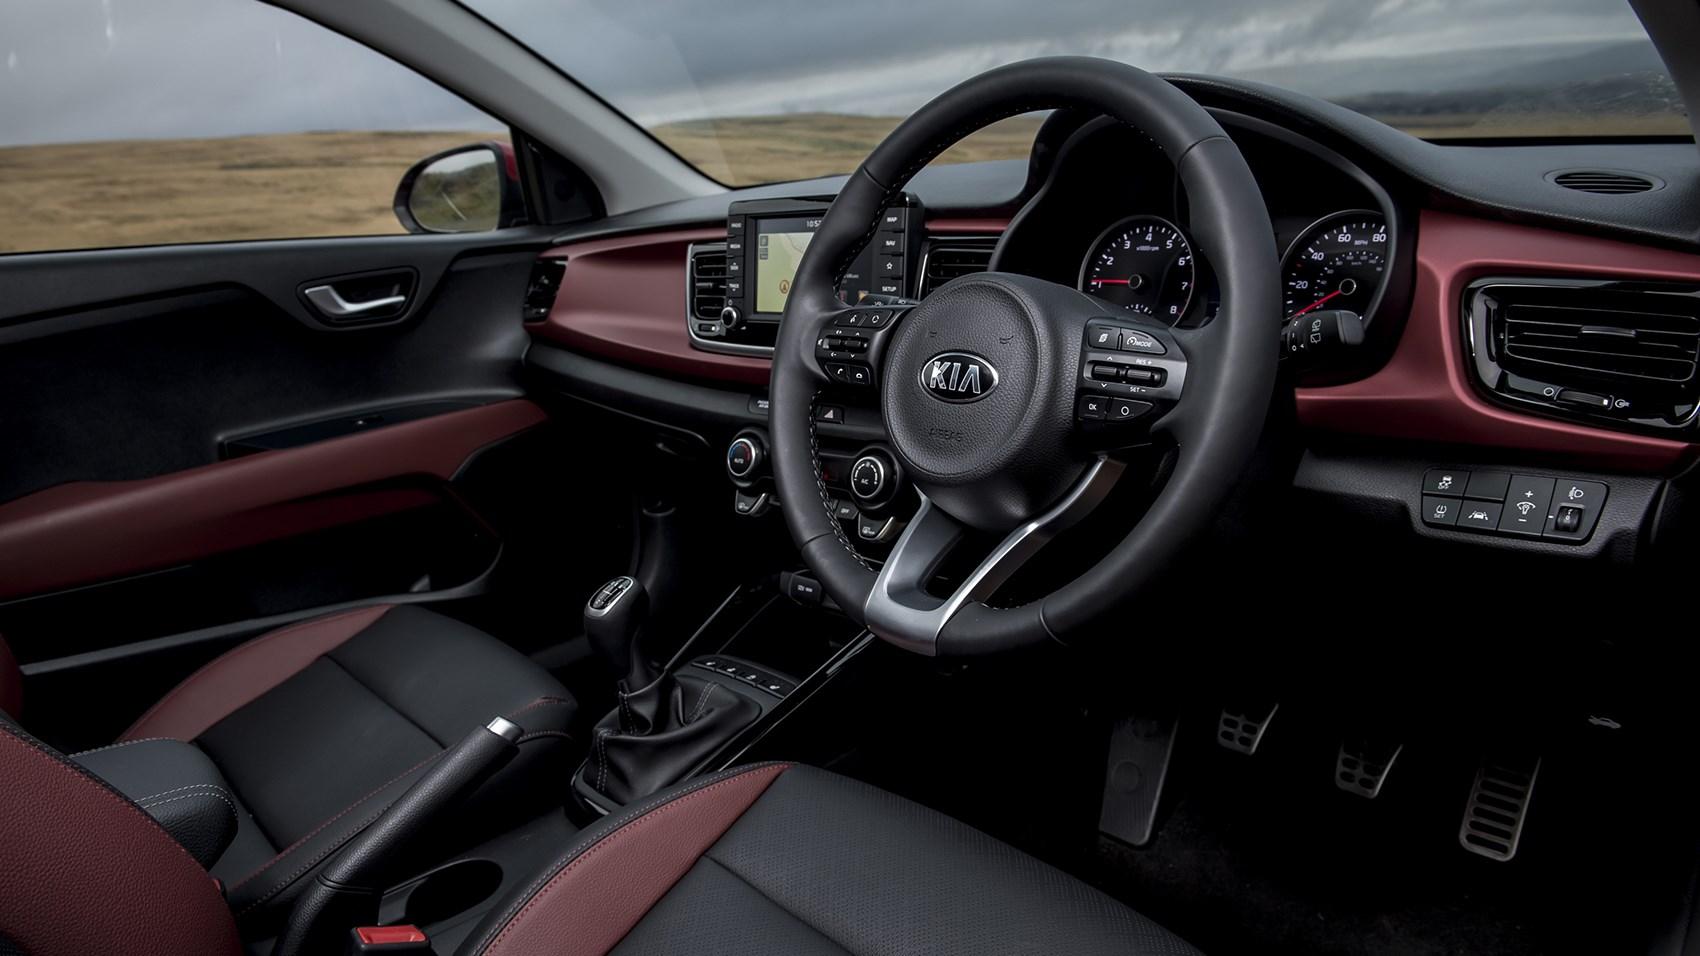 Kia Rio 3 1 0 T-GDi 99bhp (2017) review | CAR Magazine